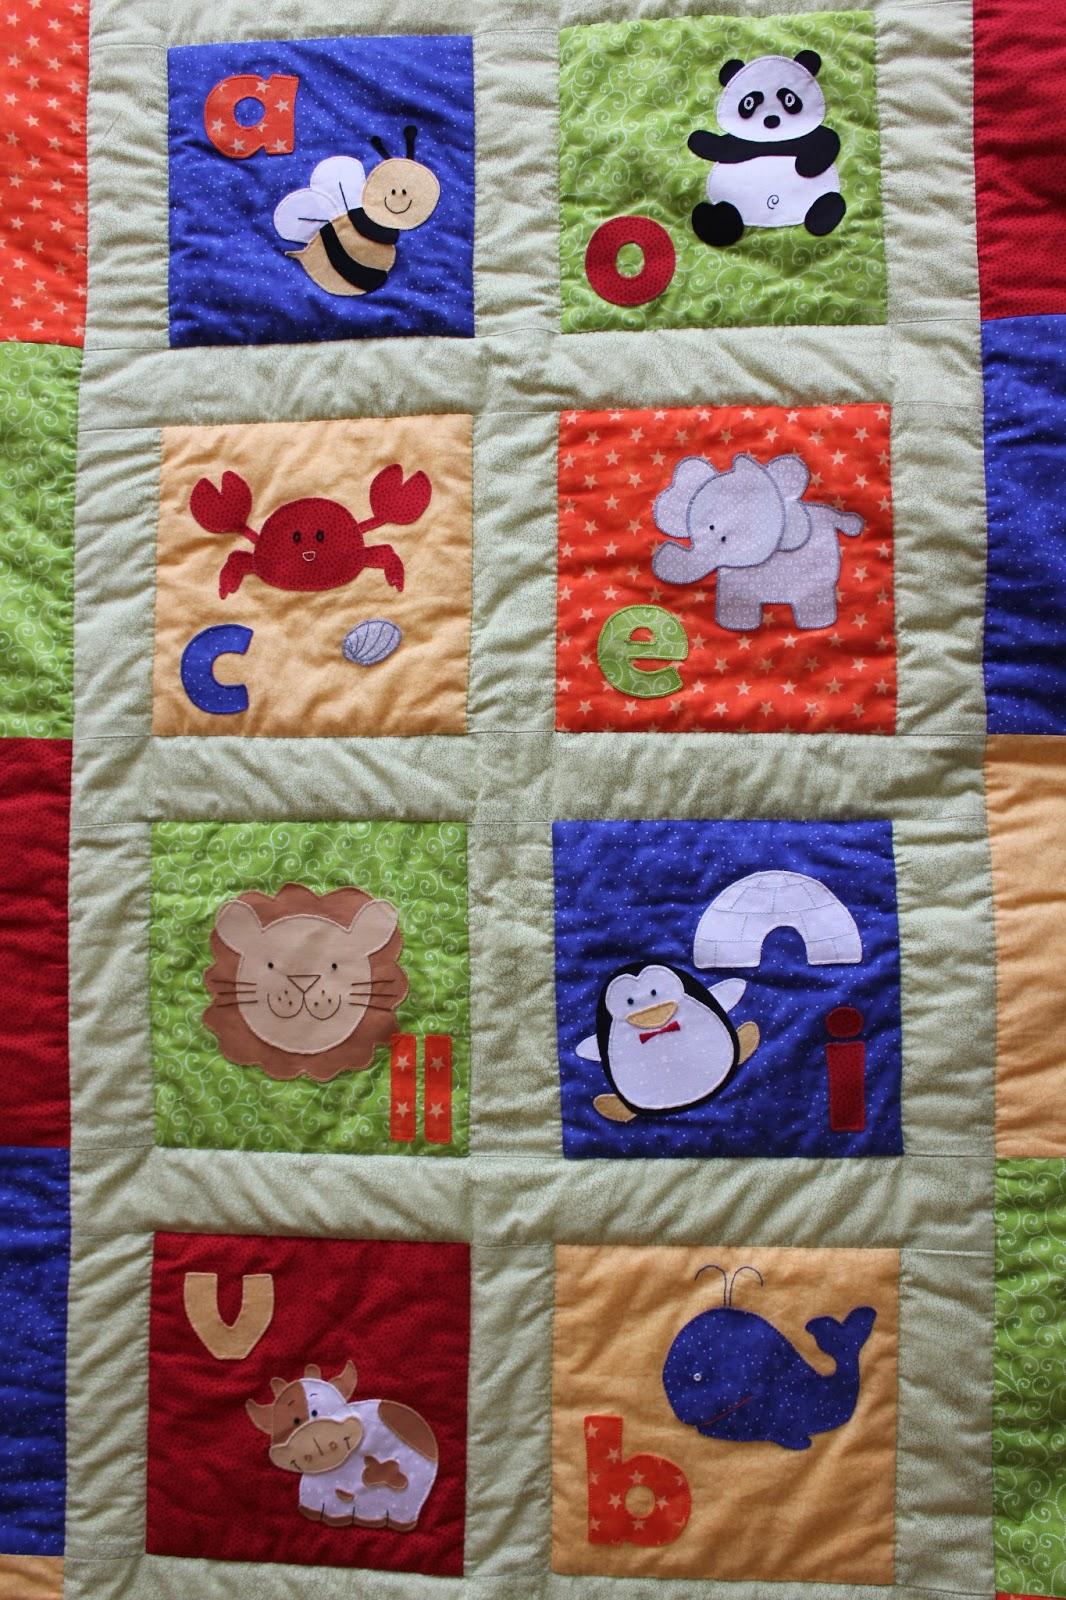 Patrones colcha patchwork beb imagui - Patrones colcha patchwork ...